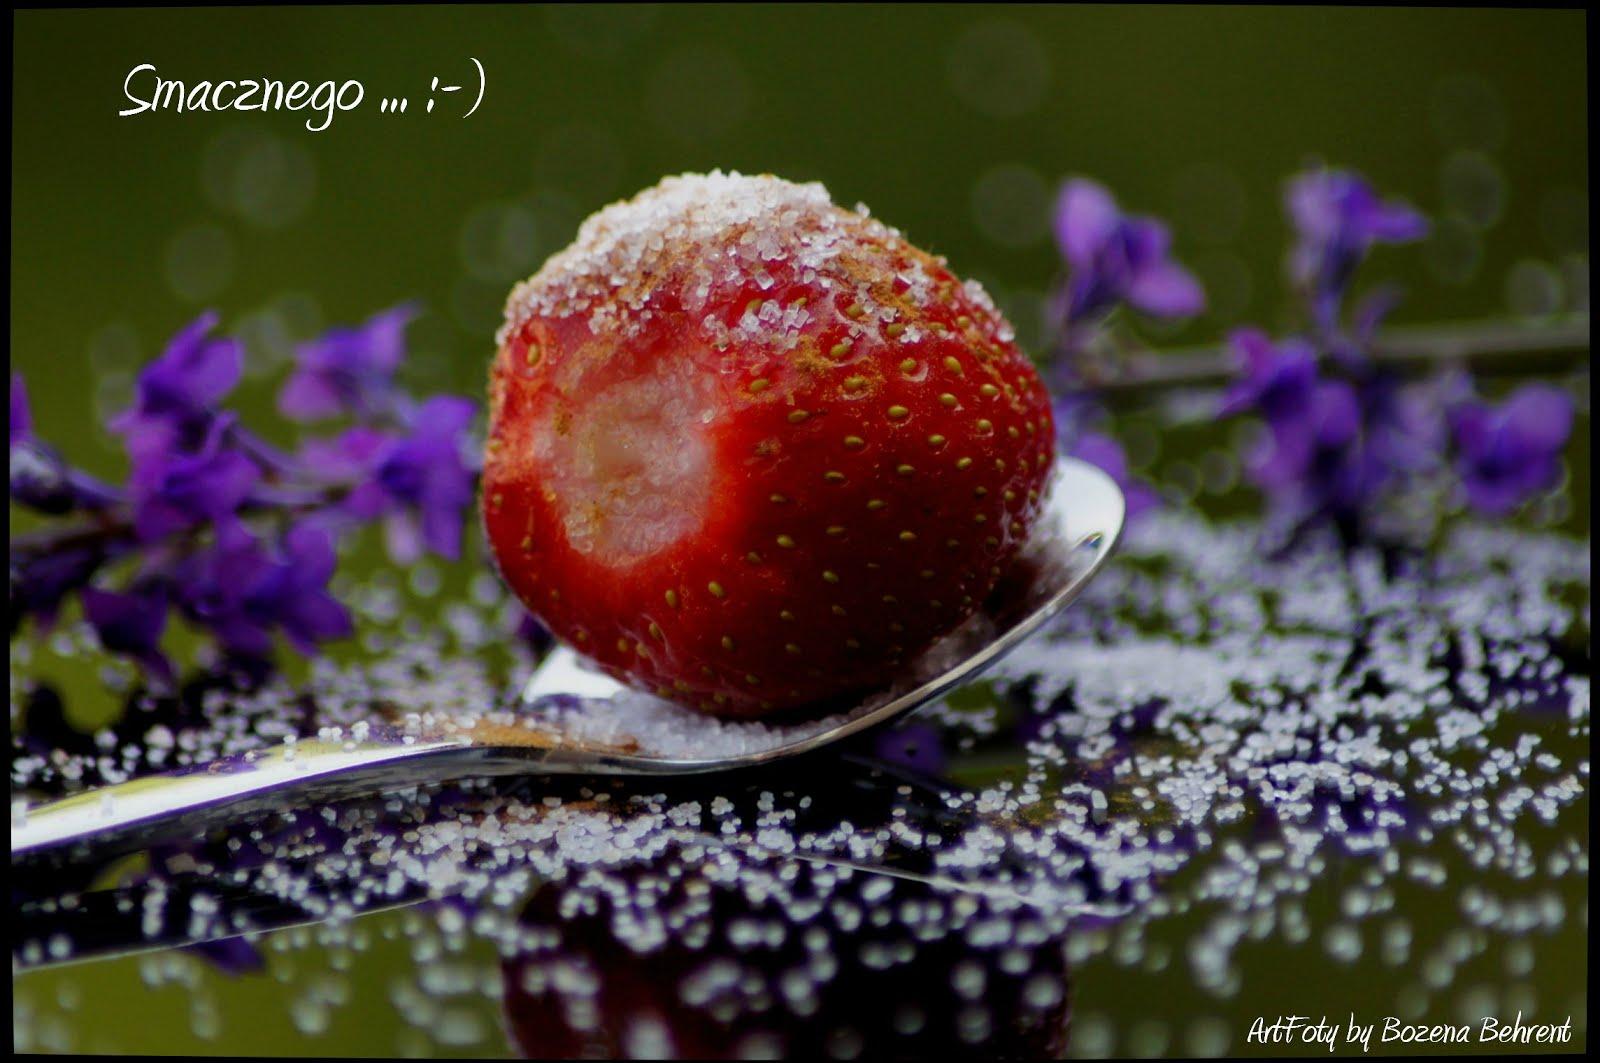 Owoce ...